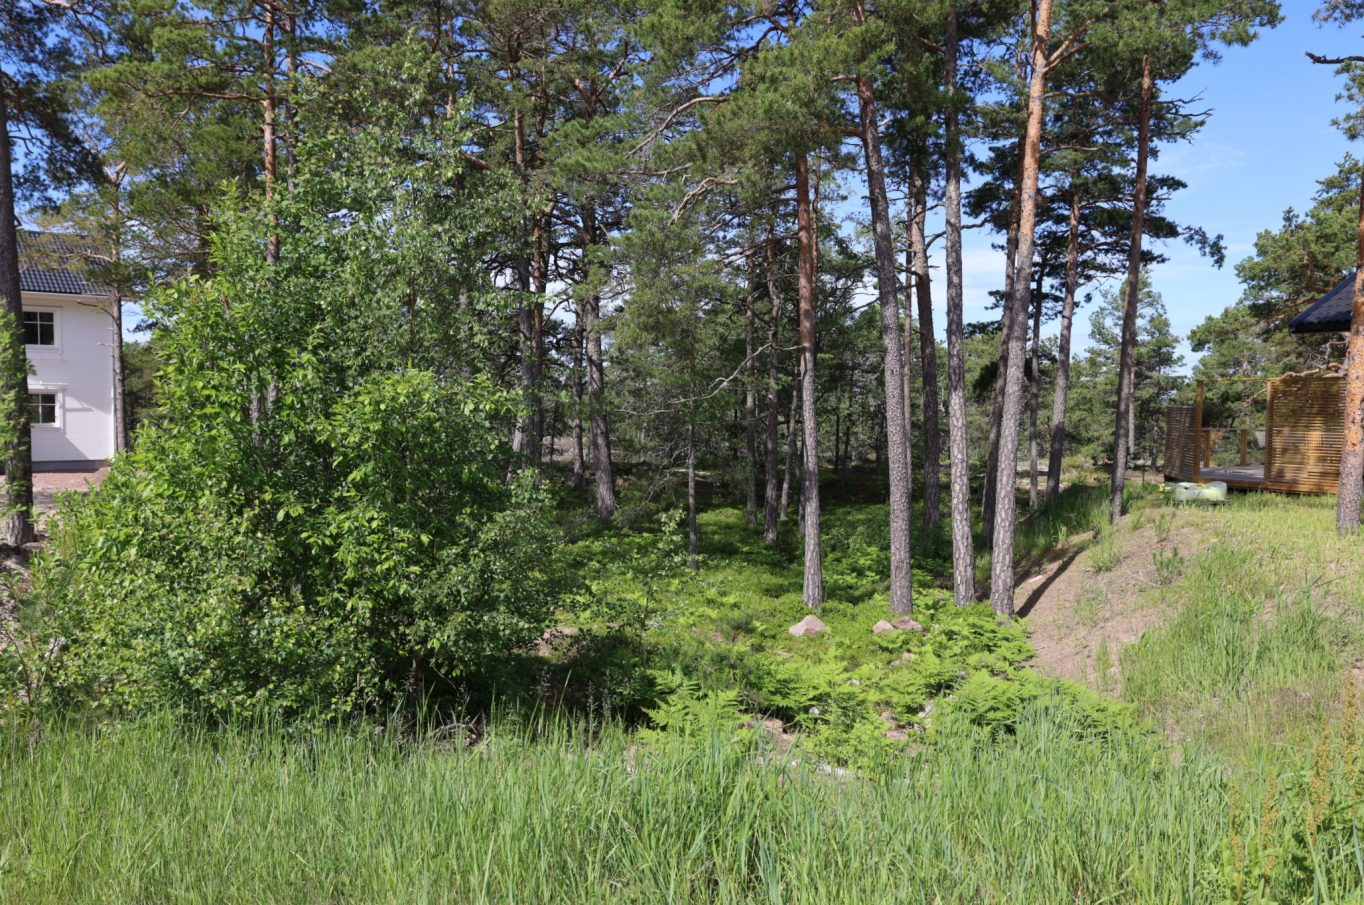 Naturnära tomt vid återvändsgränd vid Fågelberget, Jomala.